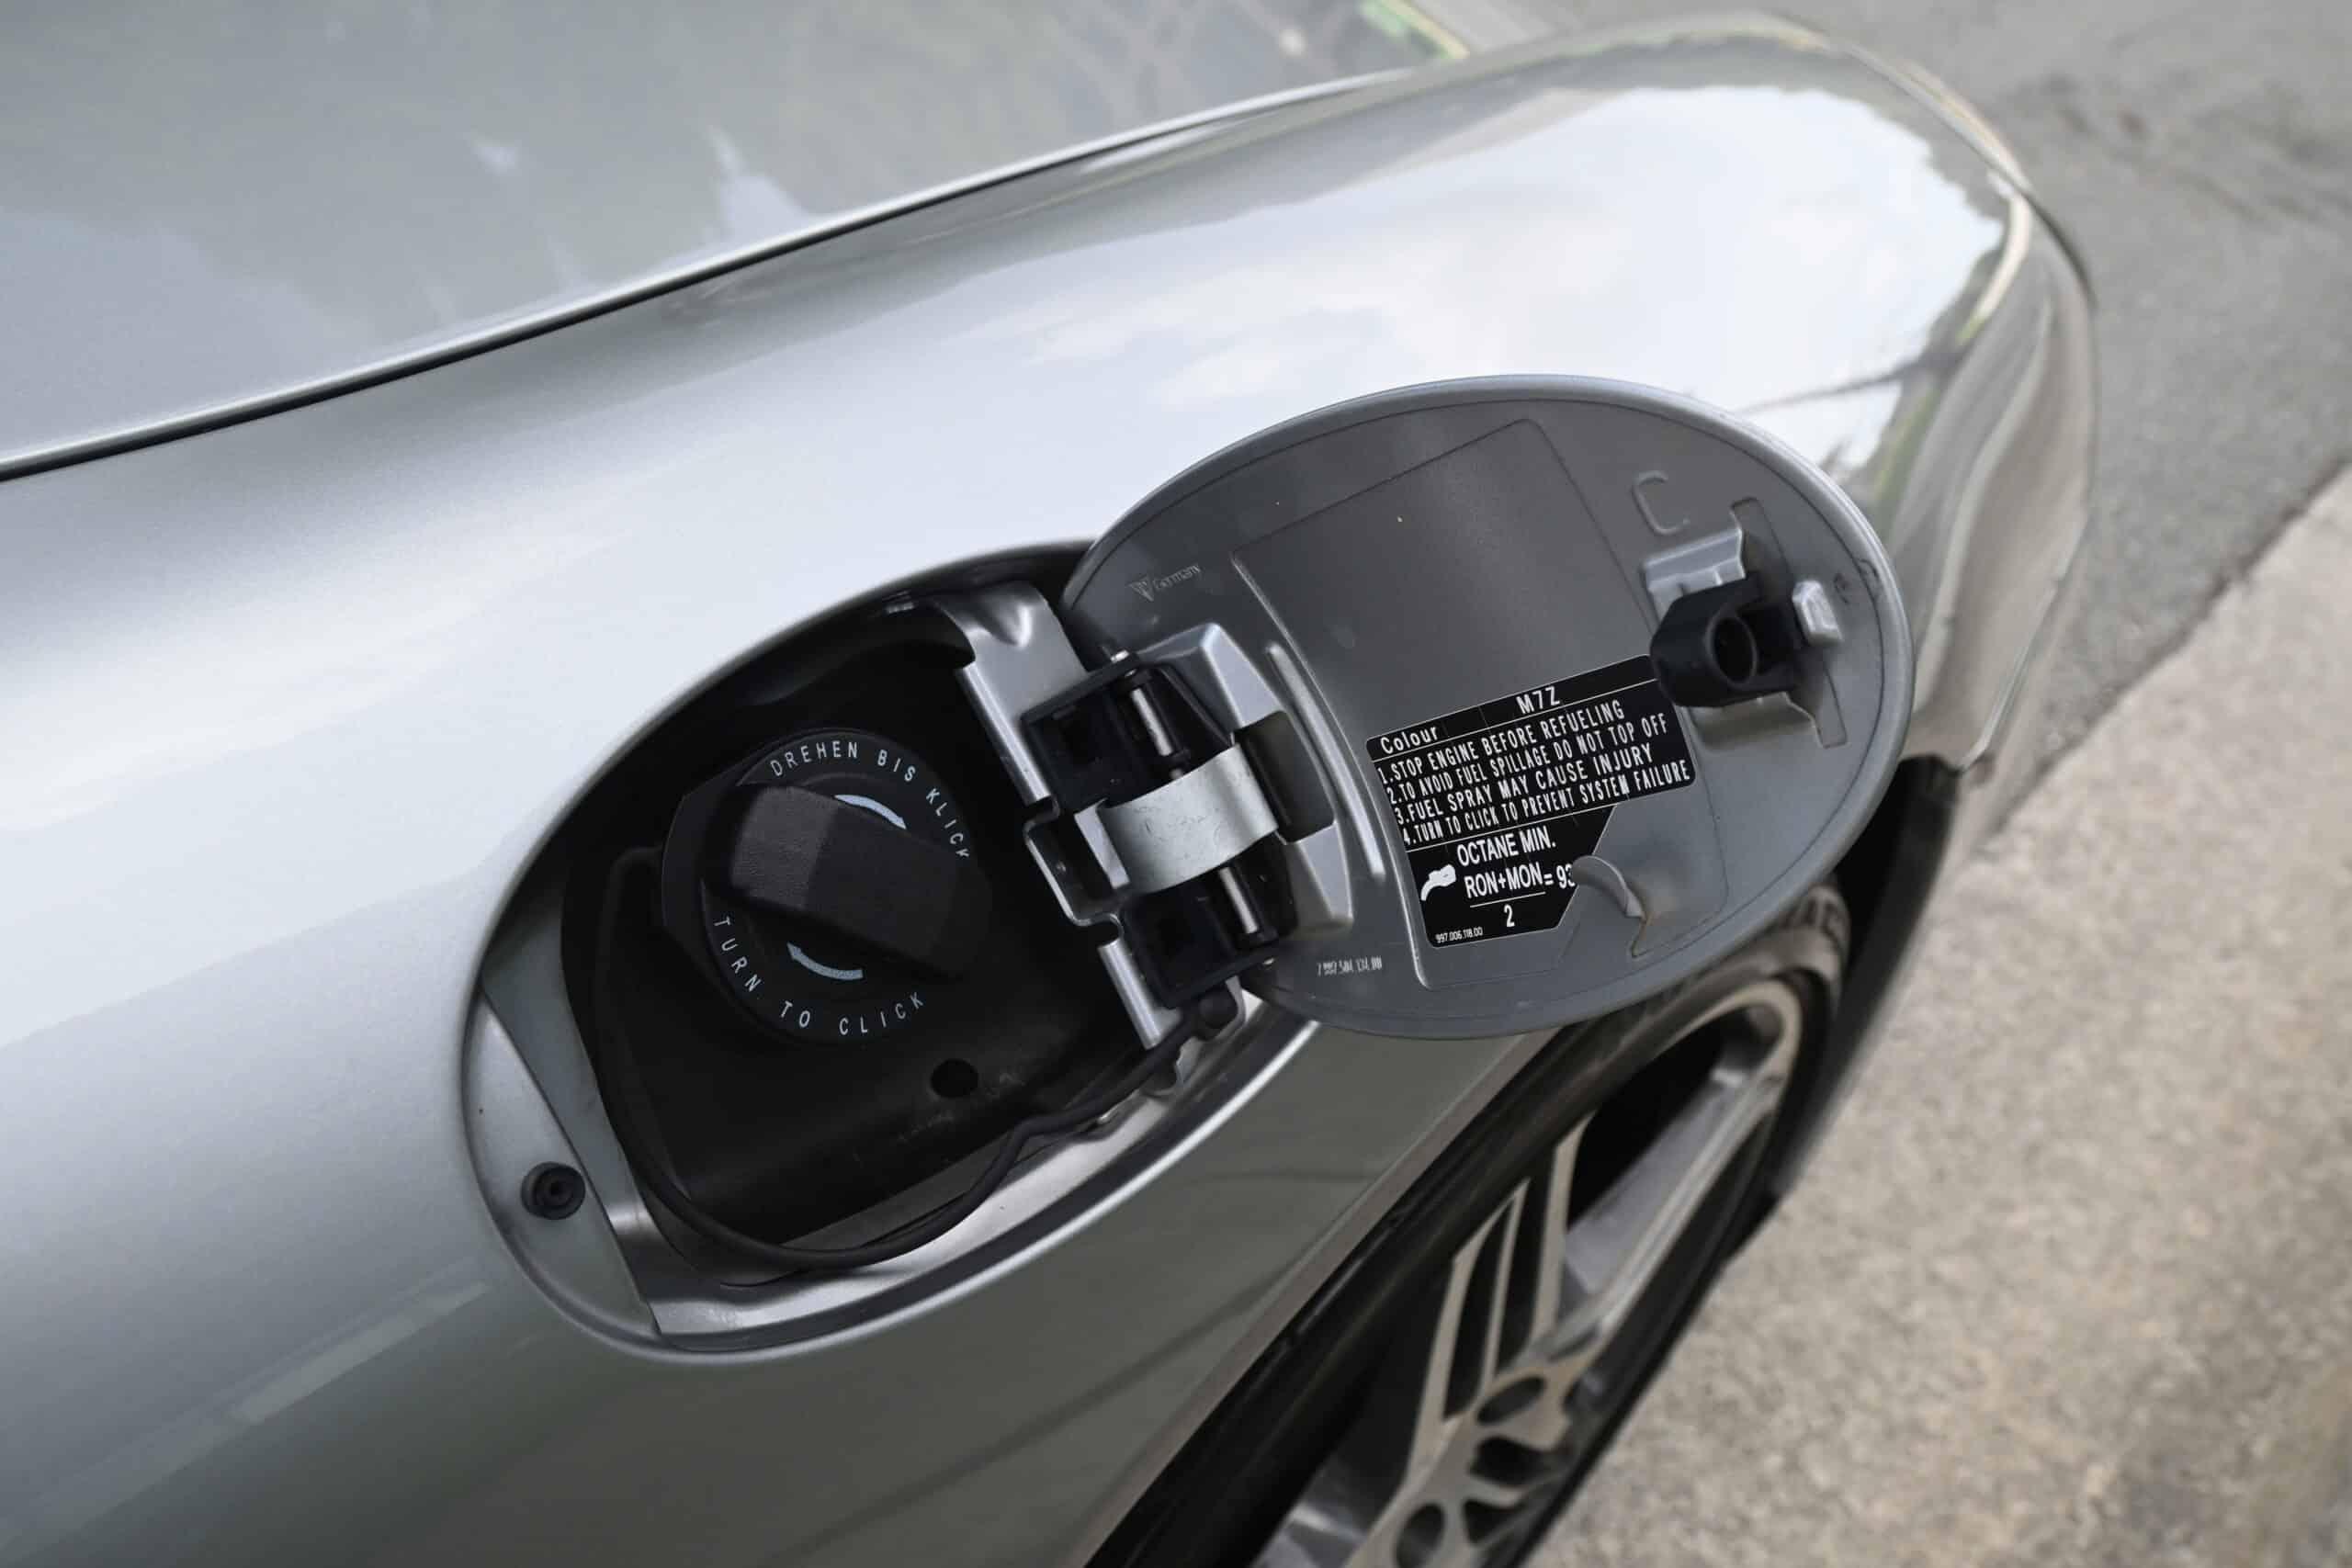 2007 Porsche 911 Turbo 997.1 6 Speed Manual-Sport Seats-Original Window Sticker-Full Service History-Stock